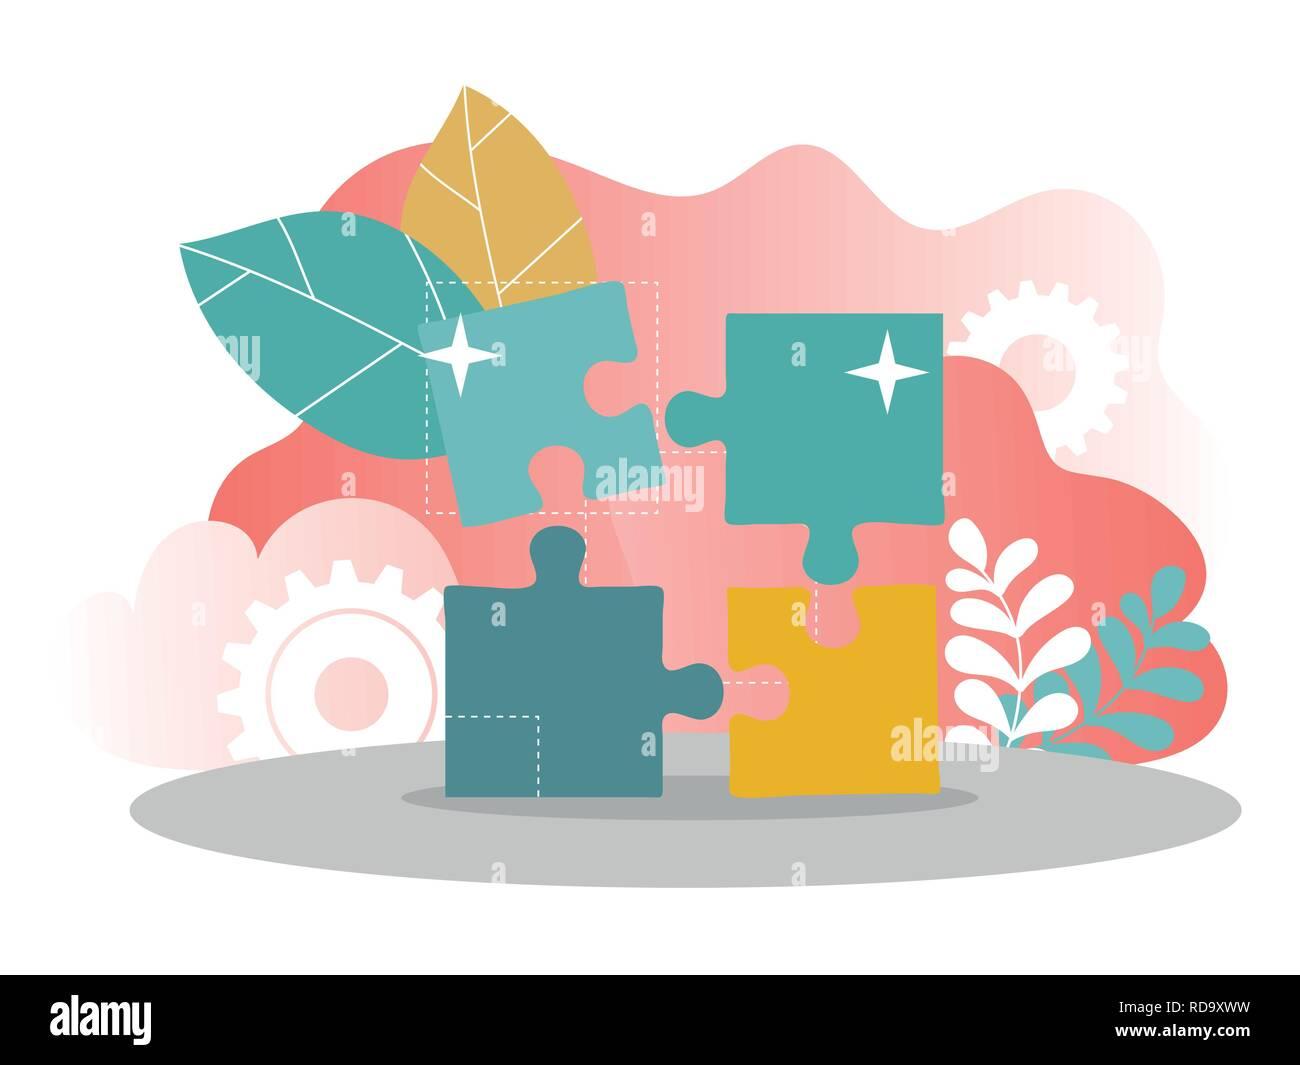 Business solution concept illustration for web design, banner, mobile app - Stock Image